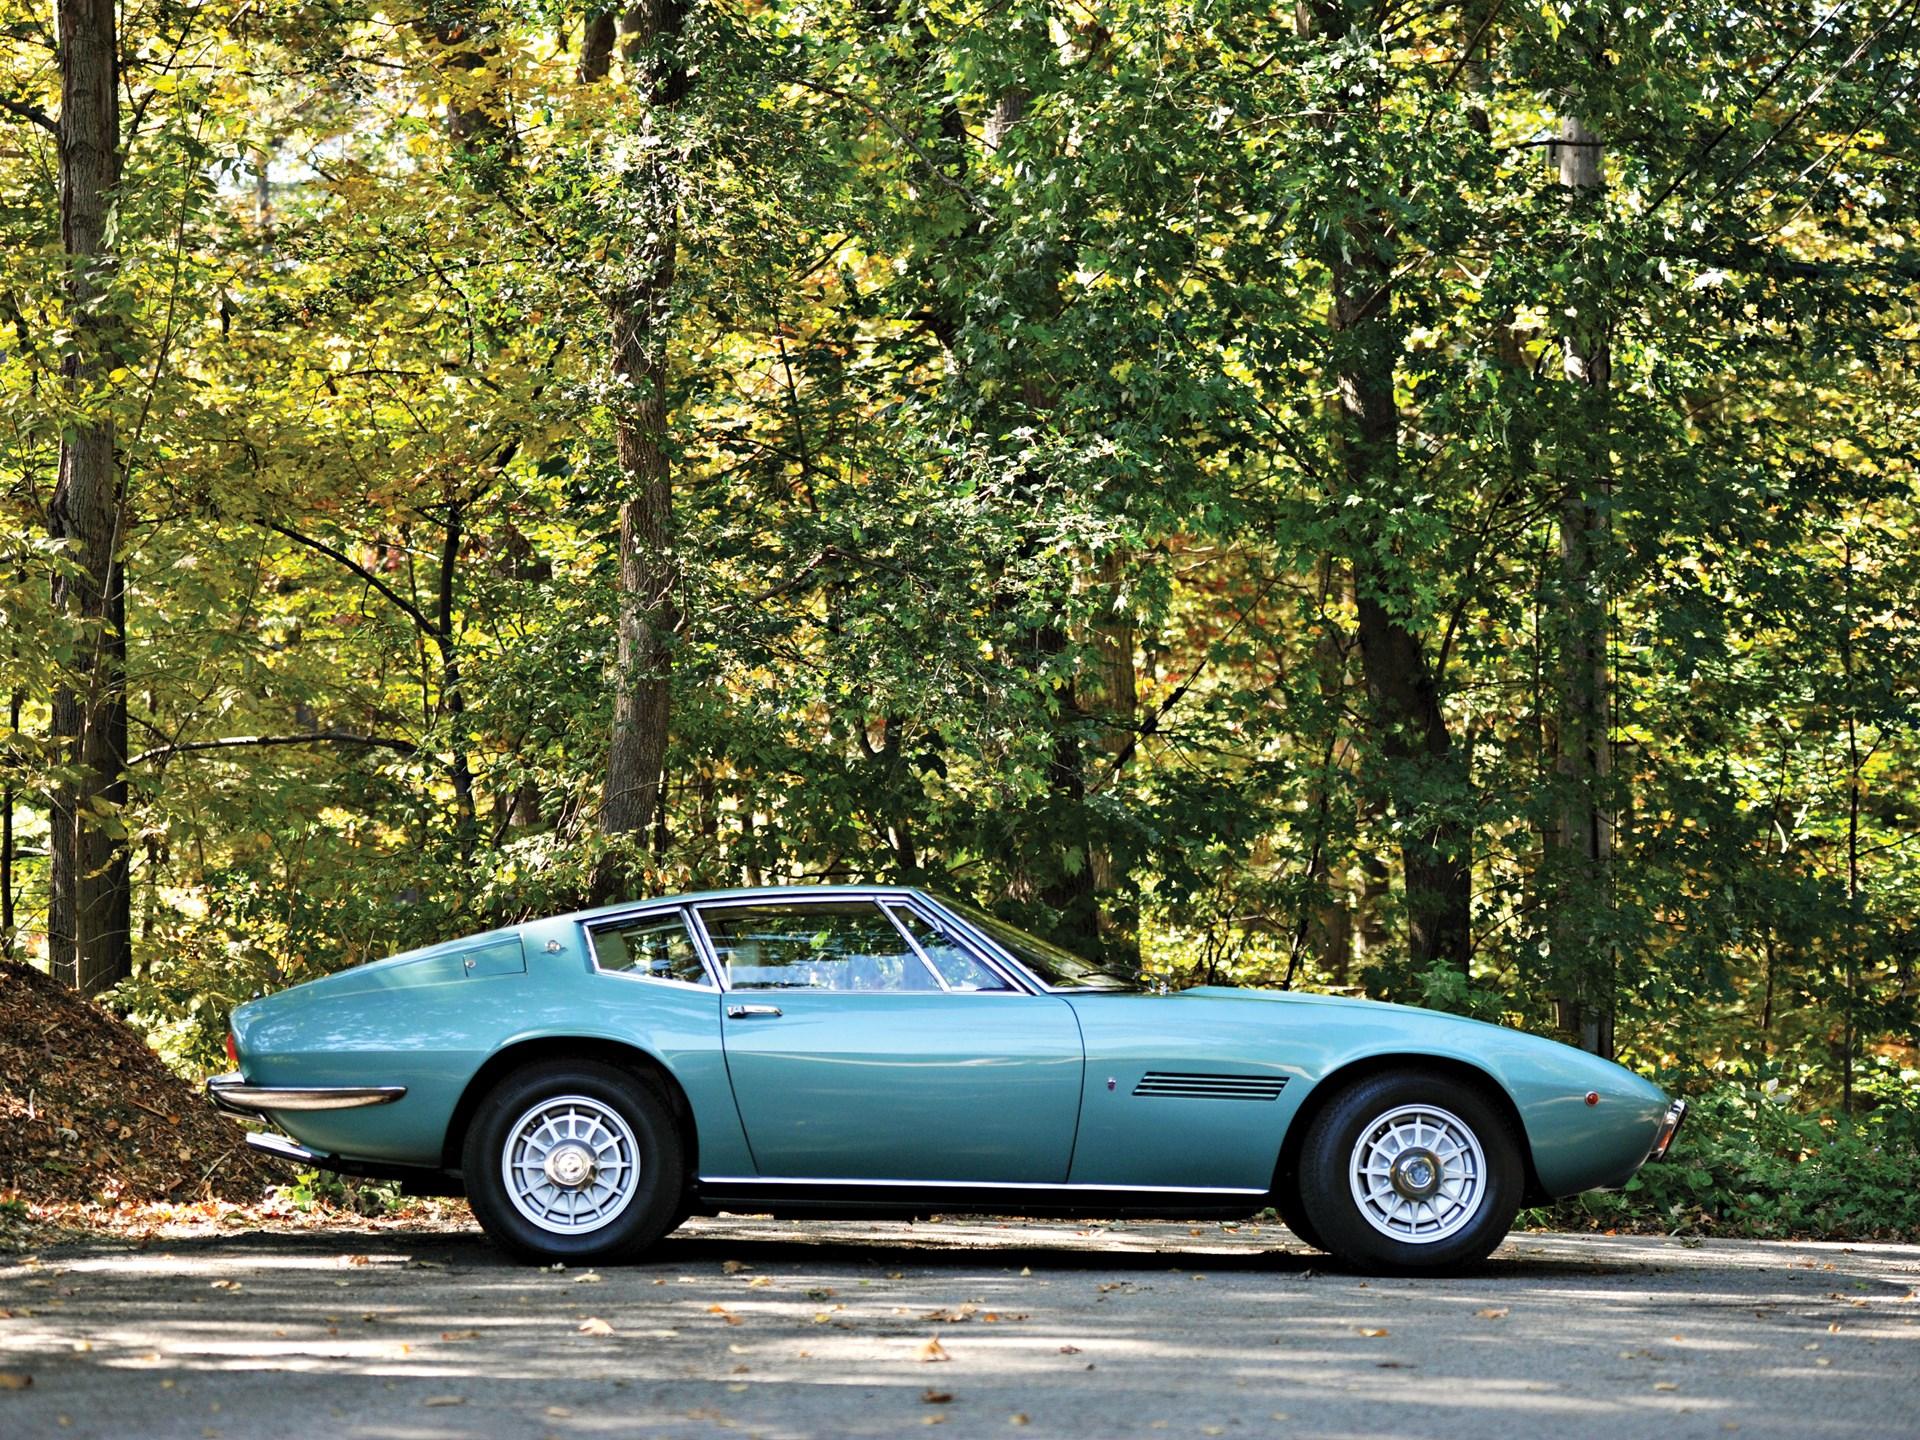 1972 Maserati Ghibli SS 4.9 Coupe by Ghia